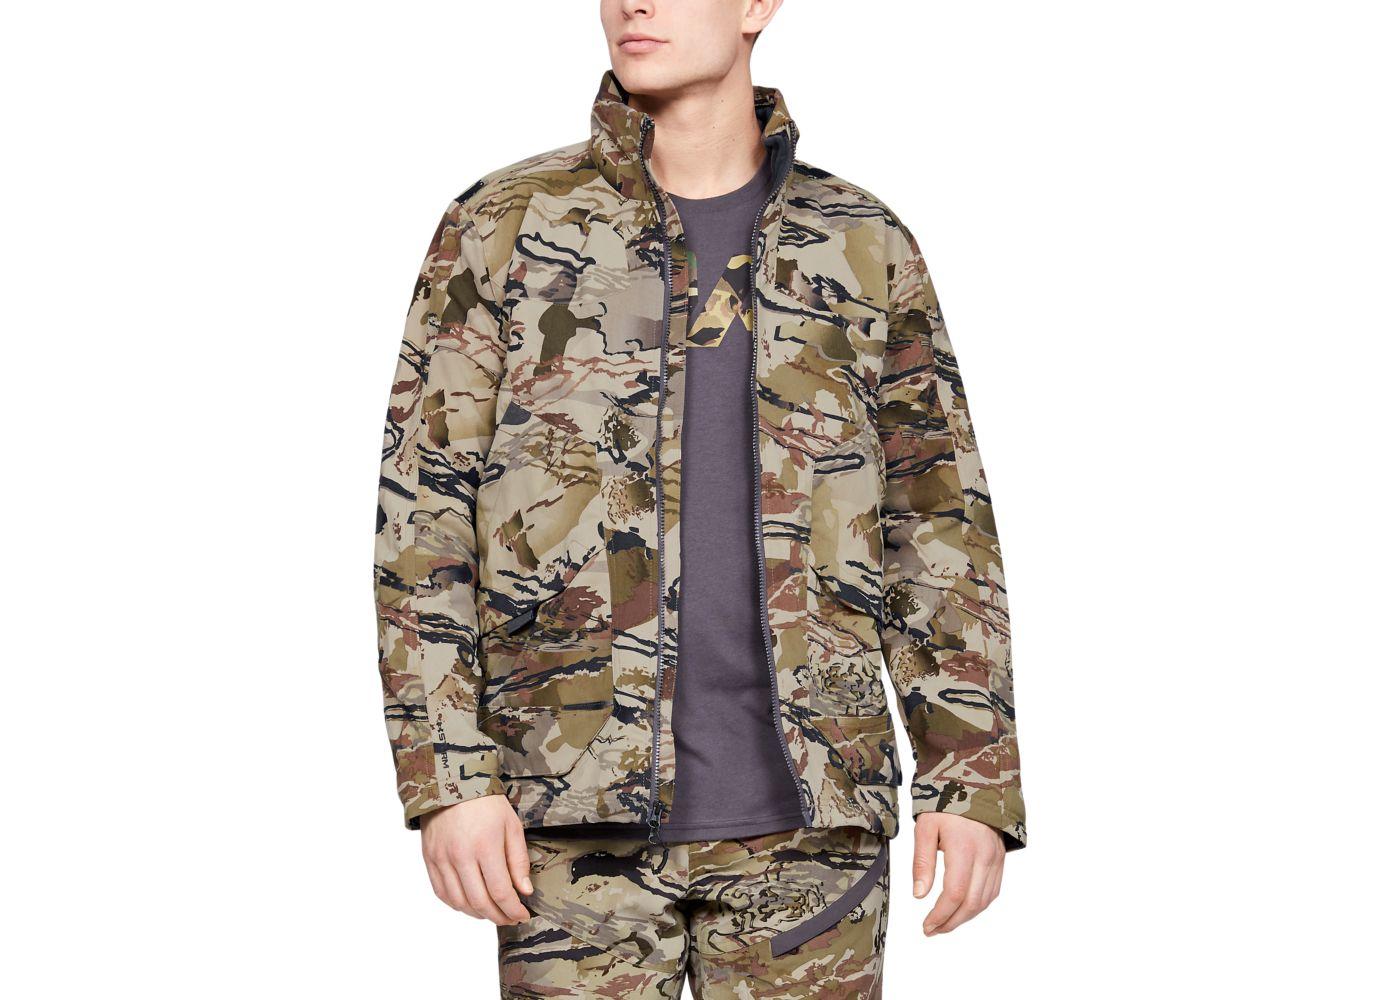 Under Armour Men's Grit Hunting Jacket